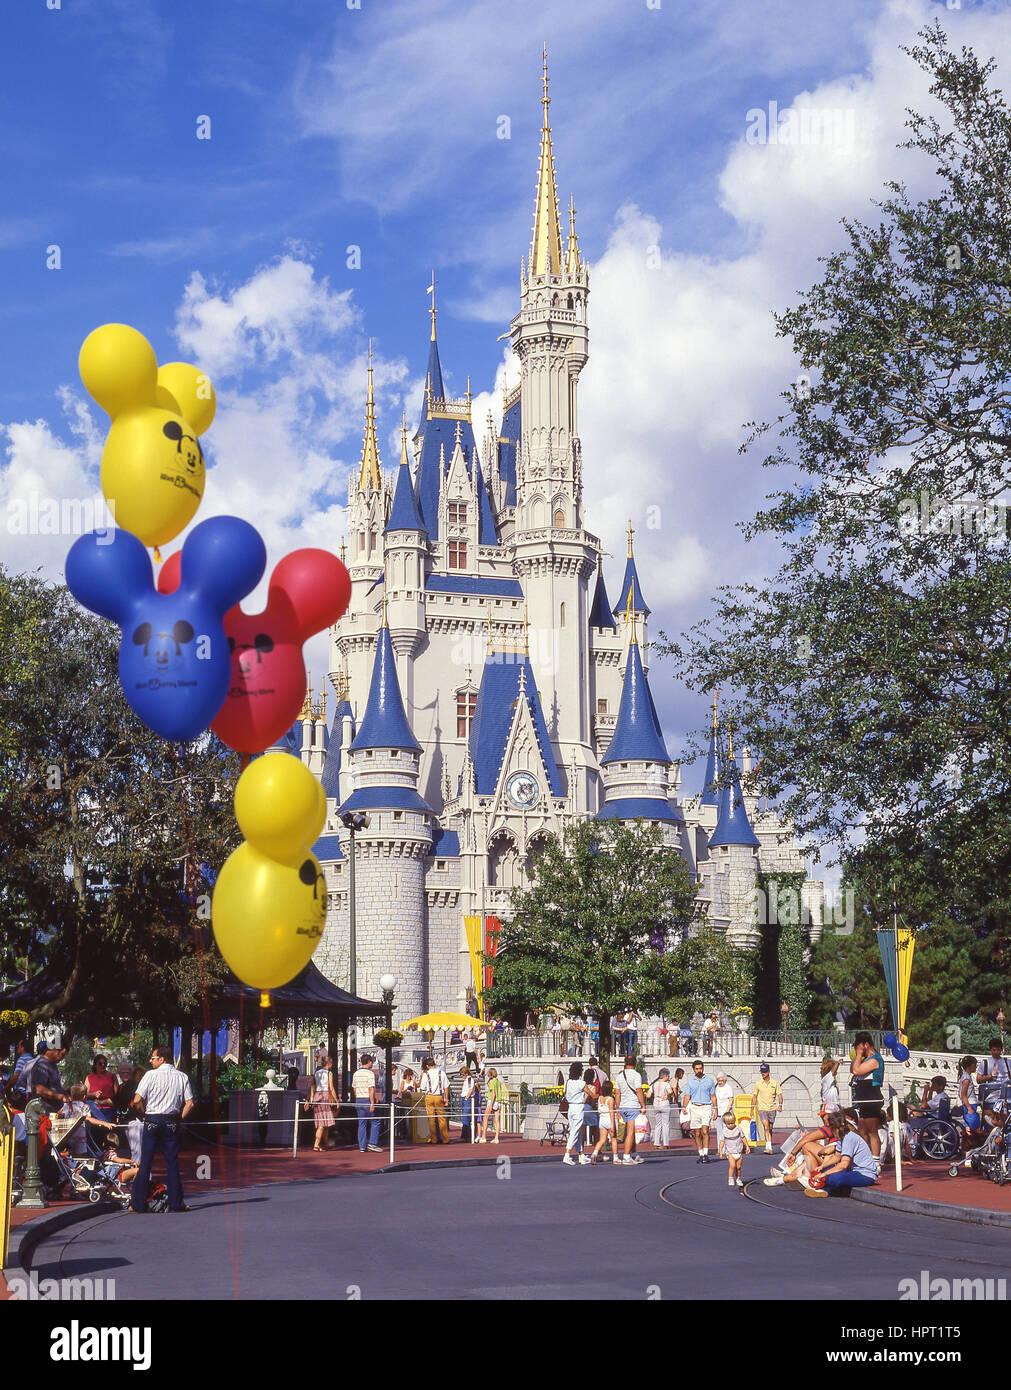 Cinderella's Castle, Magic Kingdom, Walt Disney World, Orlando, Florida, United States of America - Stock Image